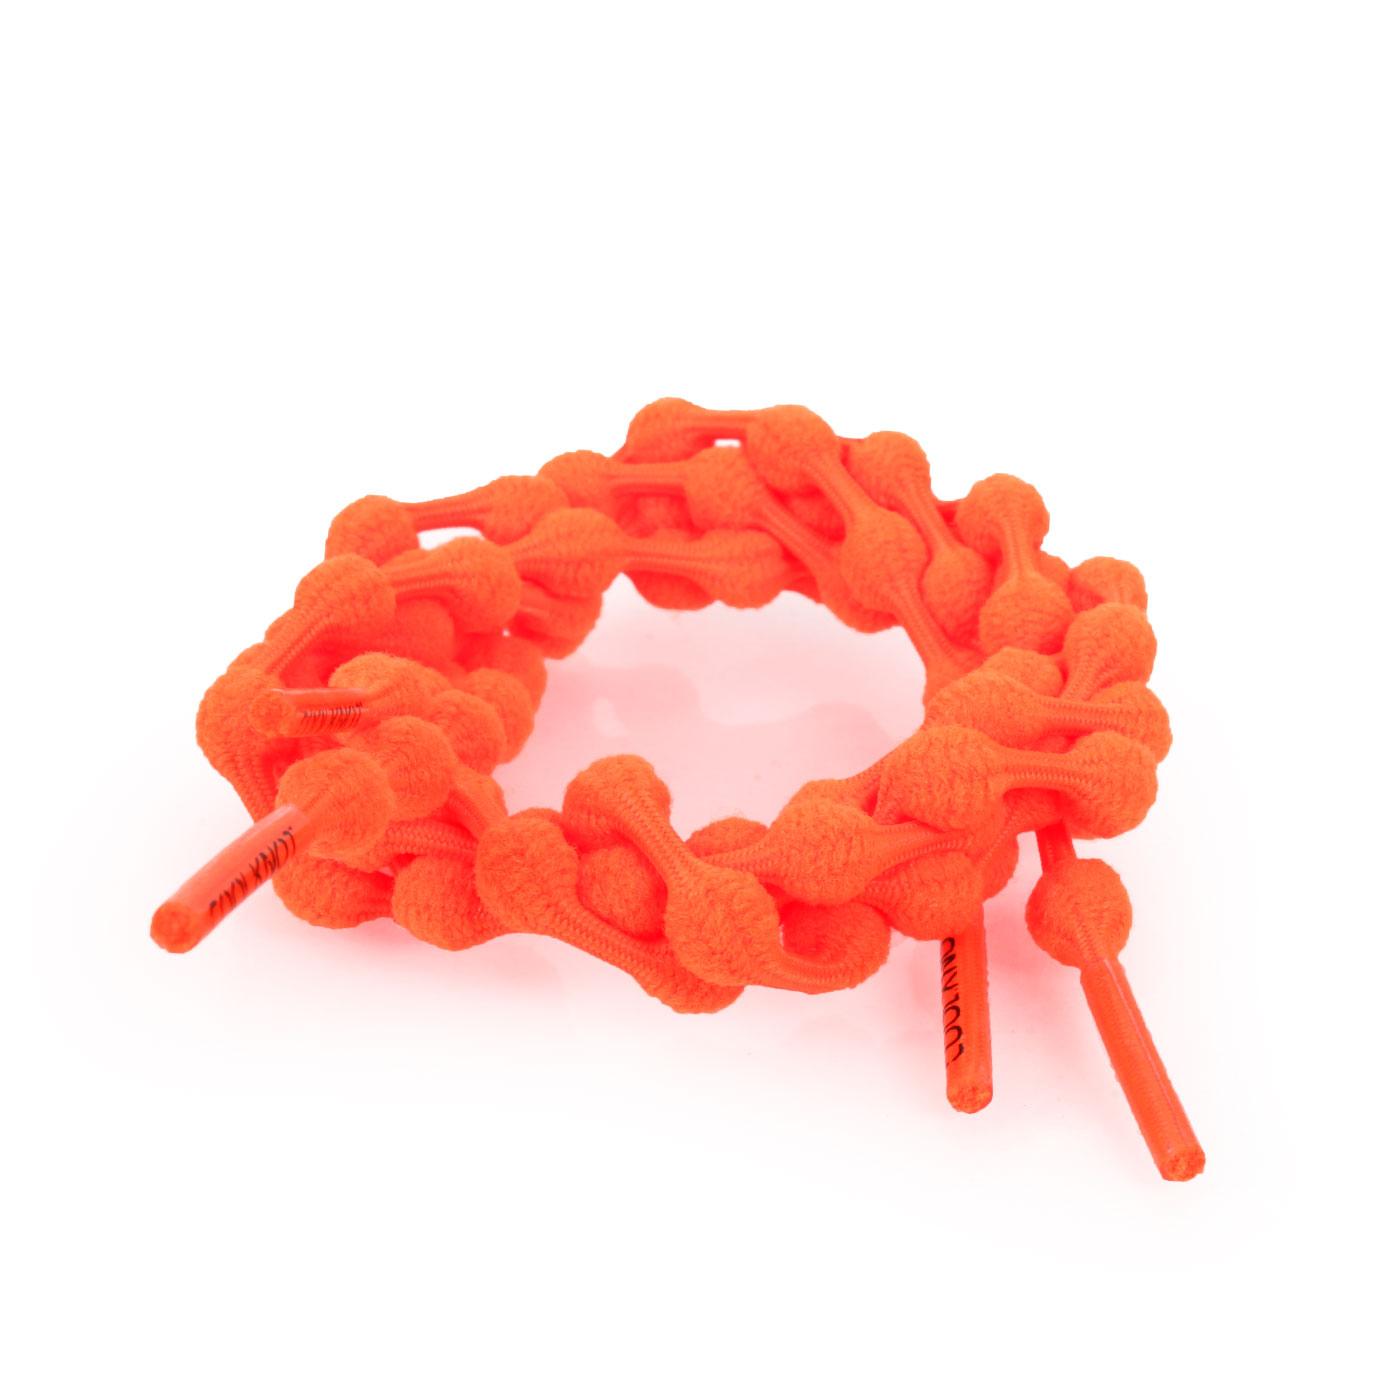 COOLKNOT 豆豆鞋帶(舒適款)60CM 6026201 - 螢光橘